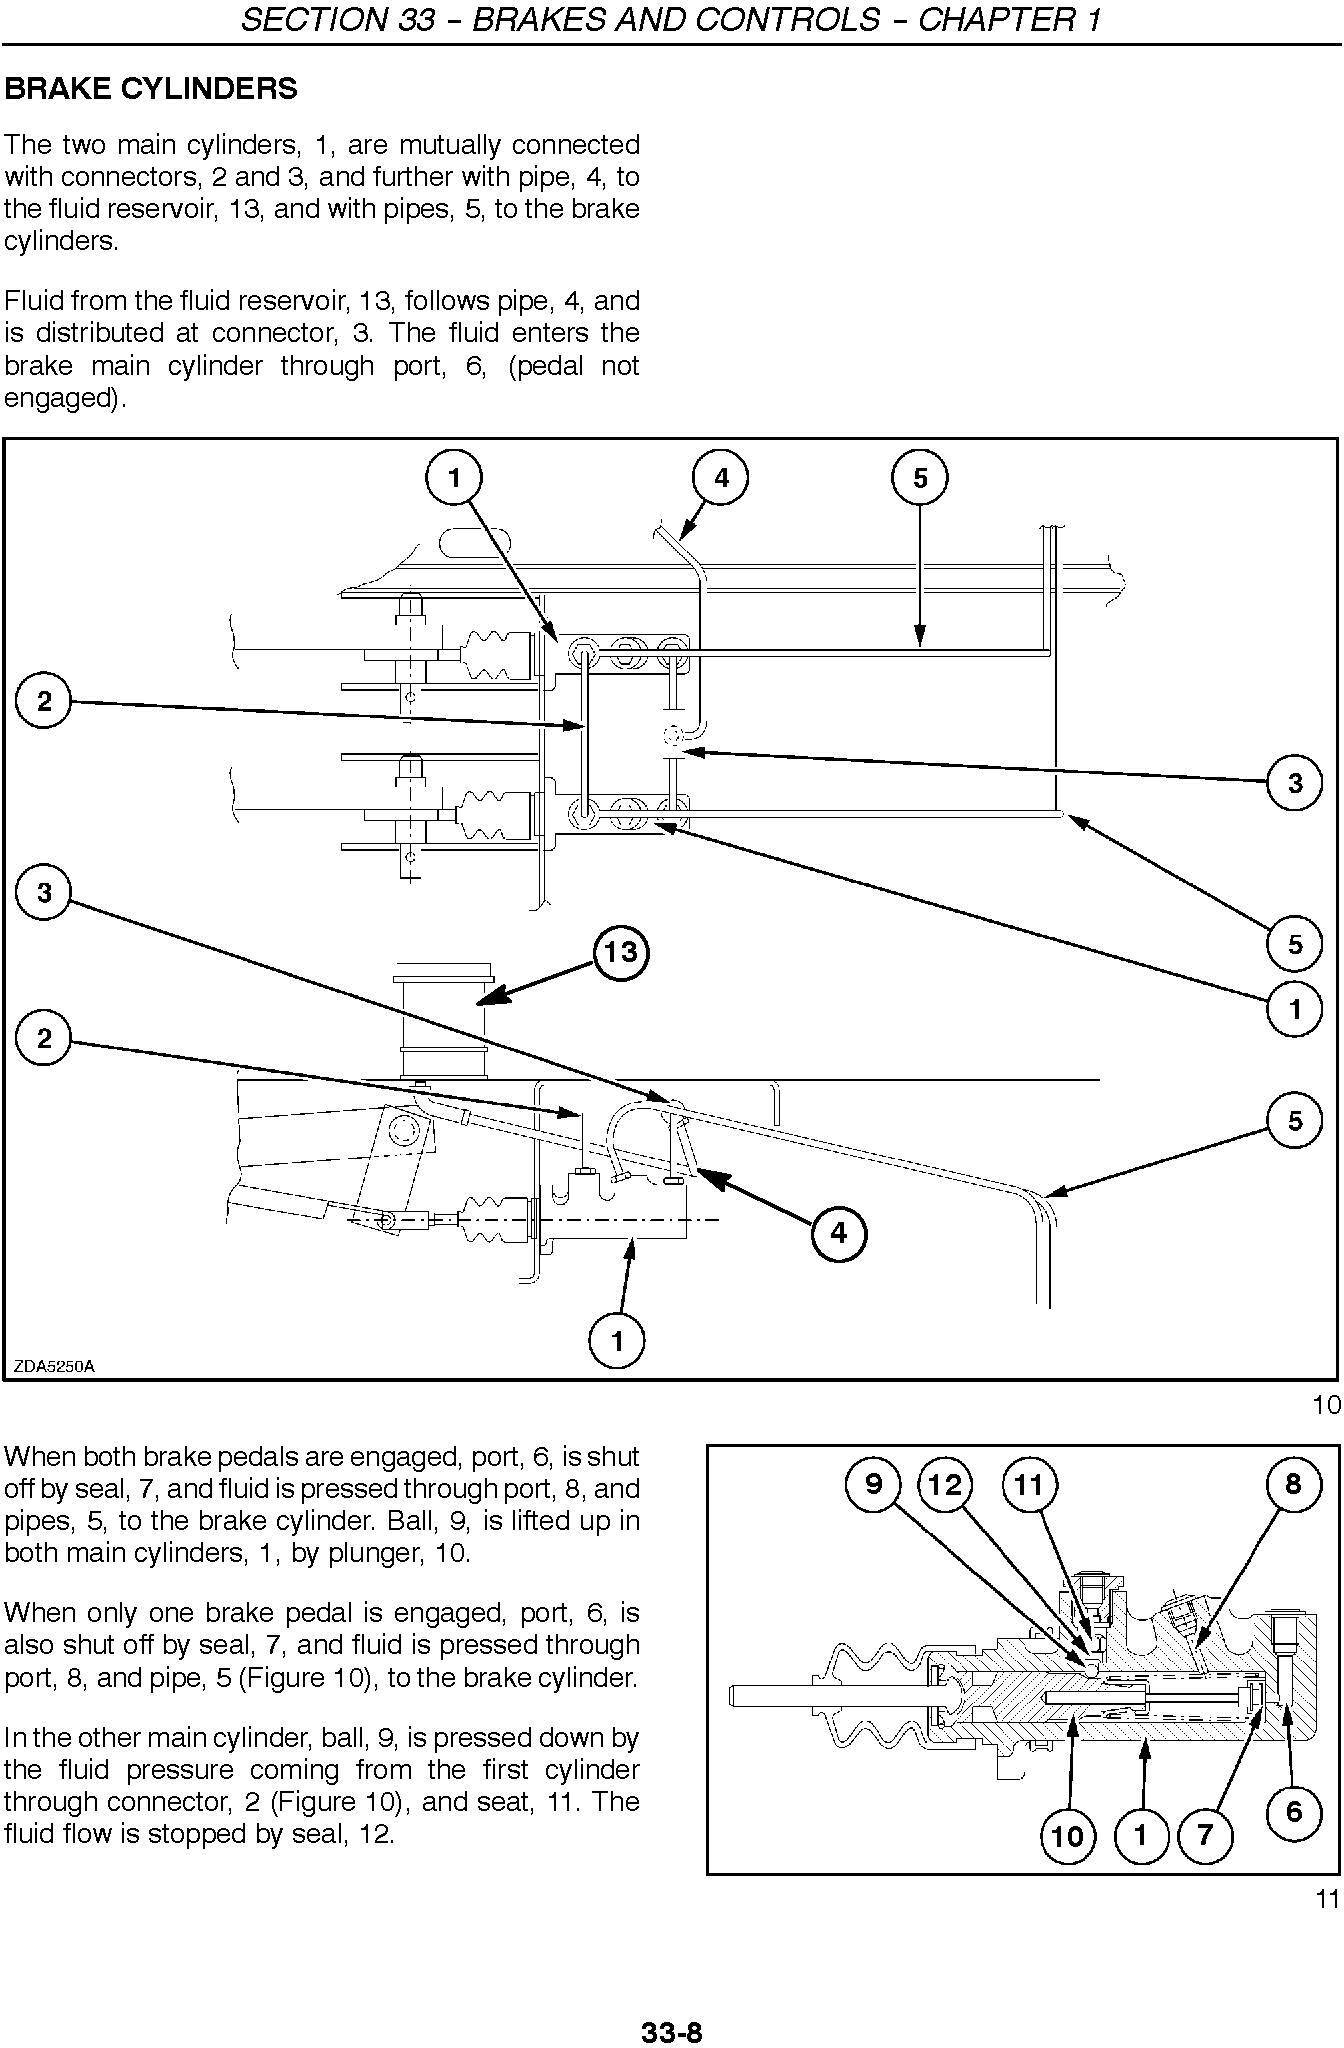 New Holland CR9040, CR9060, CR9070 Combine Service Manual - 2